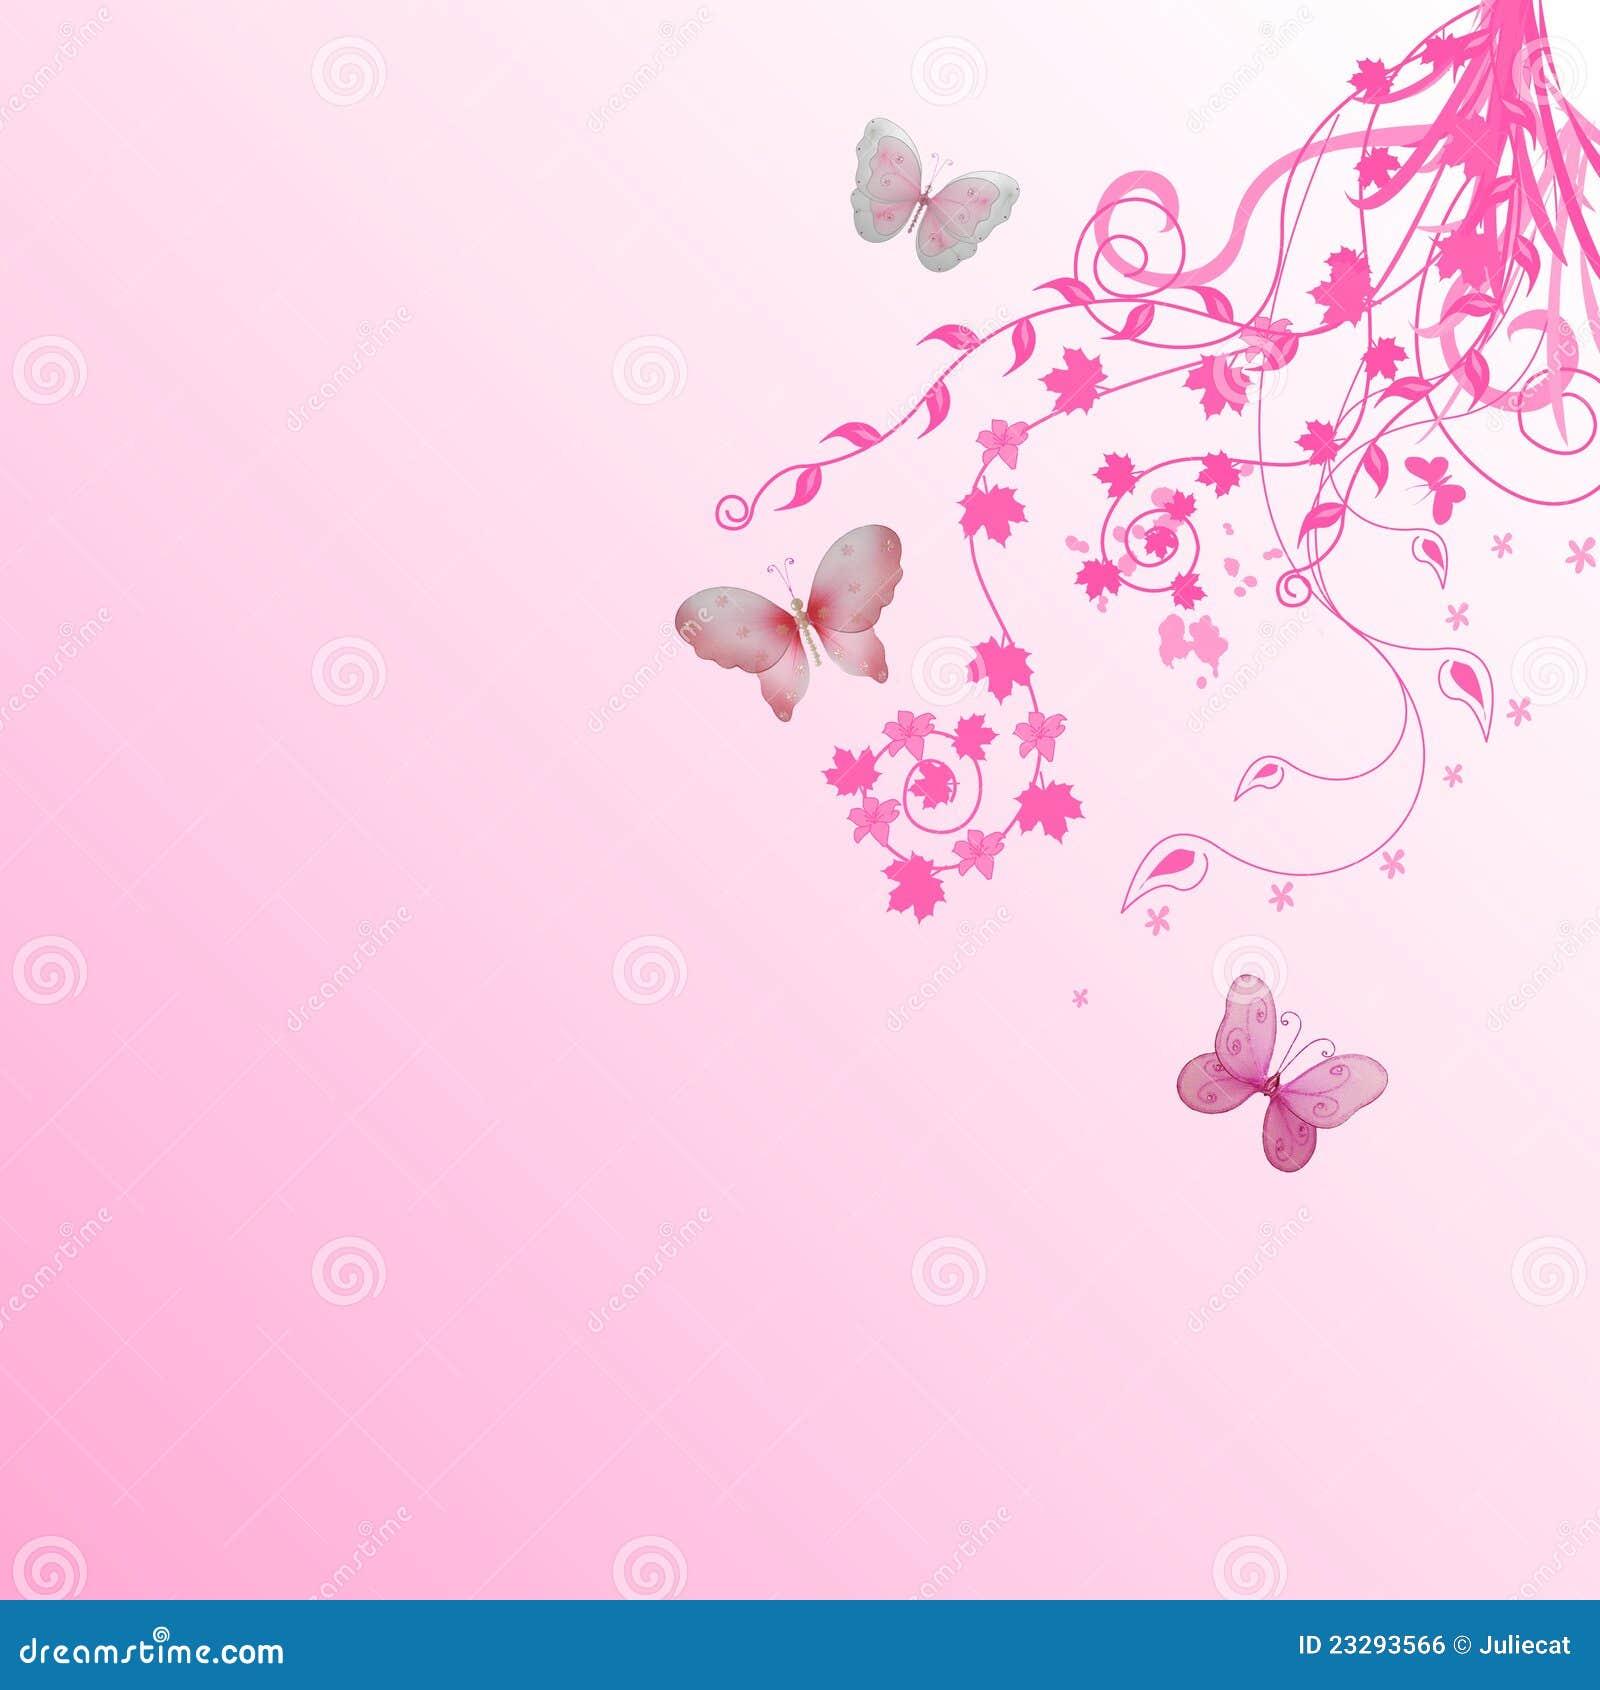 Bedroom Wallpaper Cherry Blossom